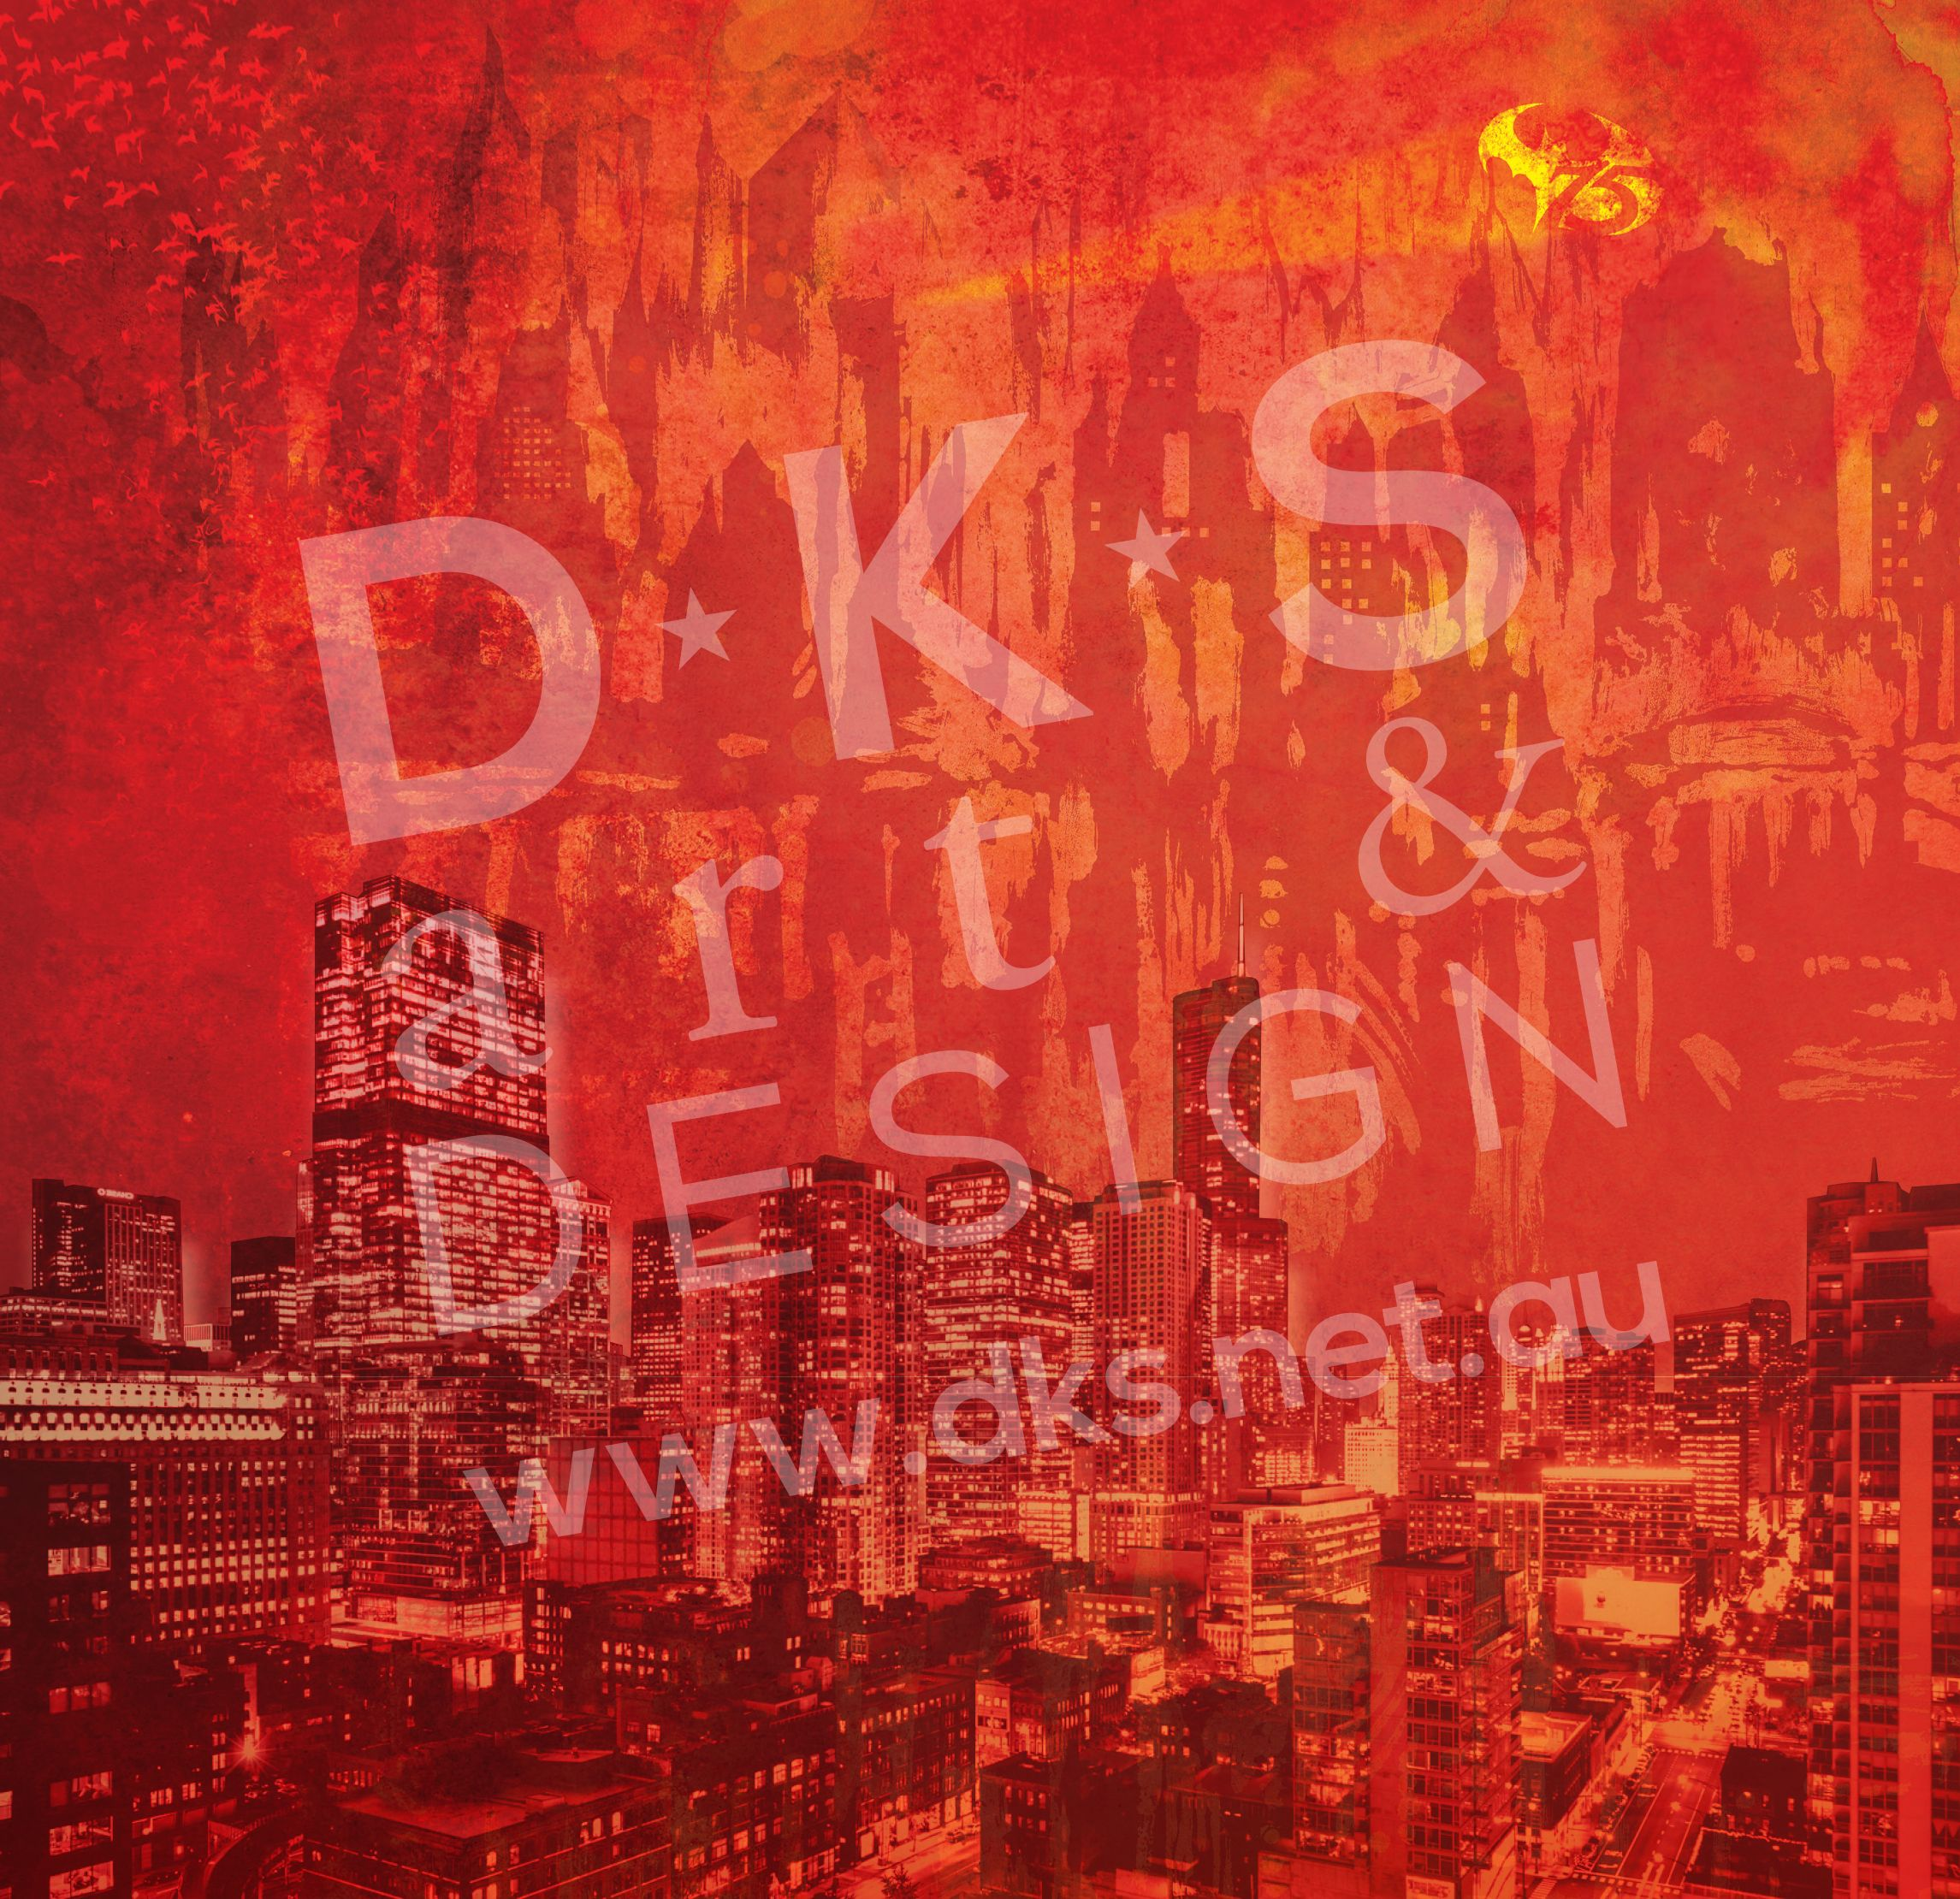 Batman Gotham City Background Design 1 For Detolf Display Cabinet. #Batman  #GothamCity #Detolf #DKSartDesign